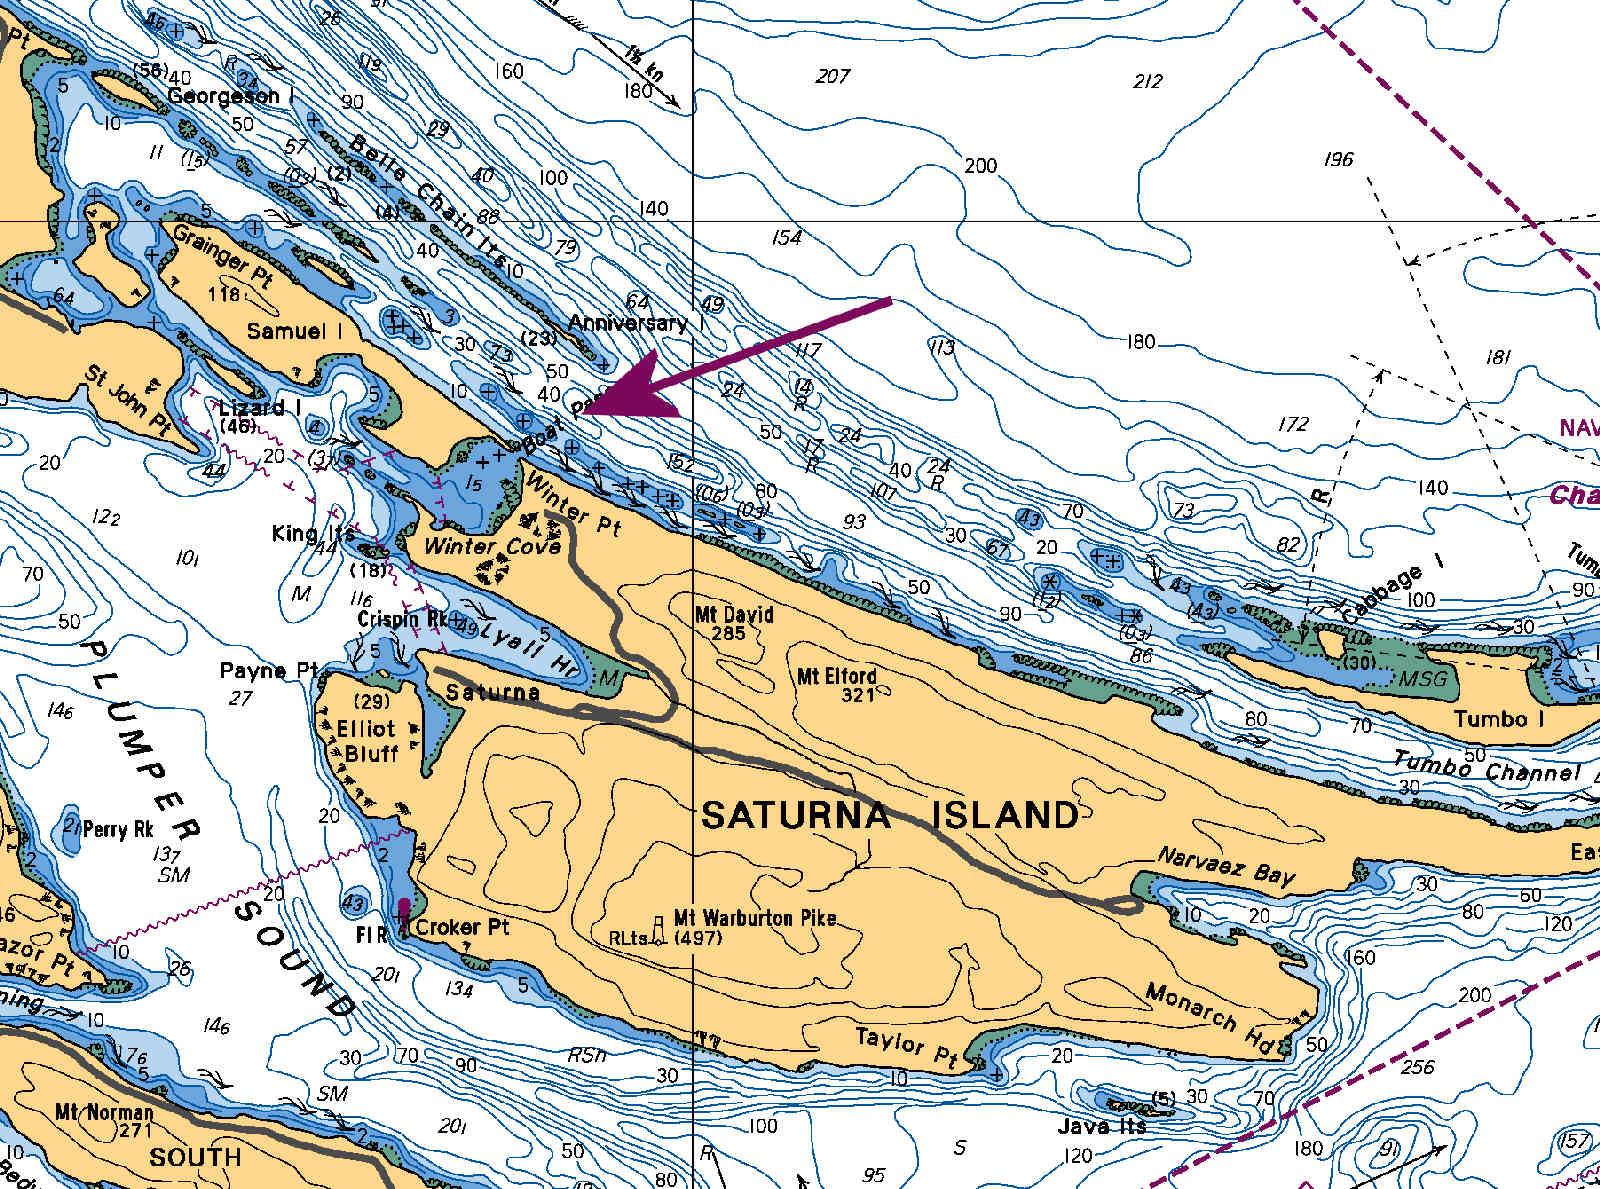 Click image for larger version  Name:saturnaisland.jpg Views:166 Size:383.8 KB ID:1515